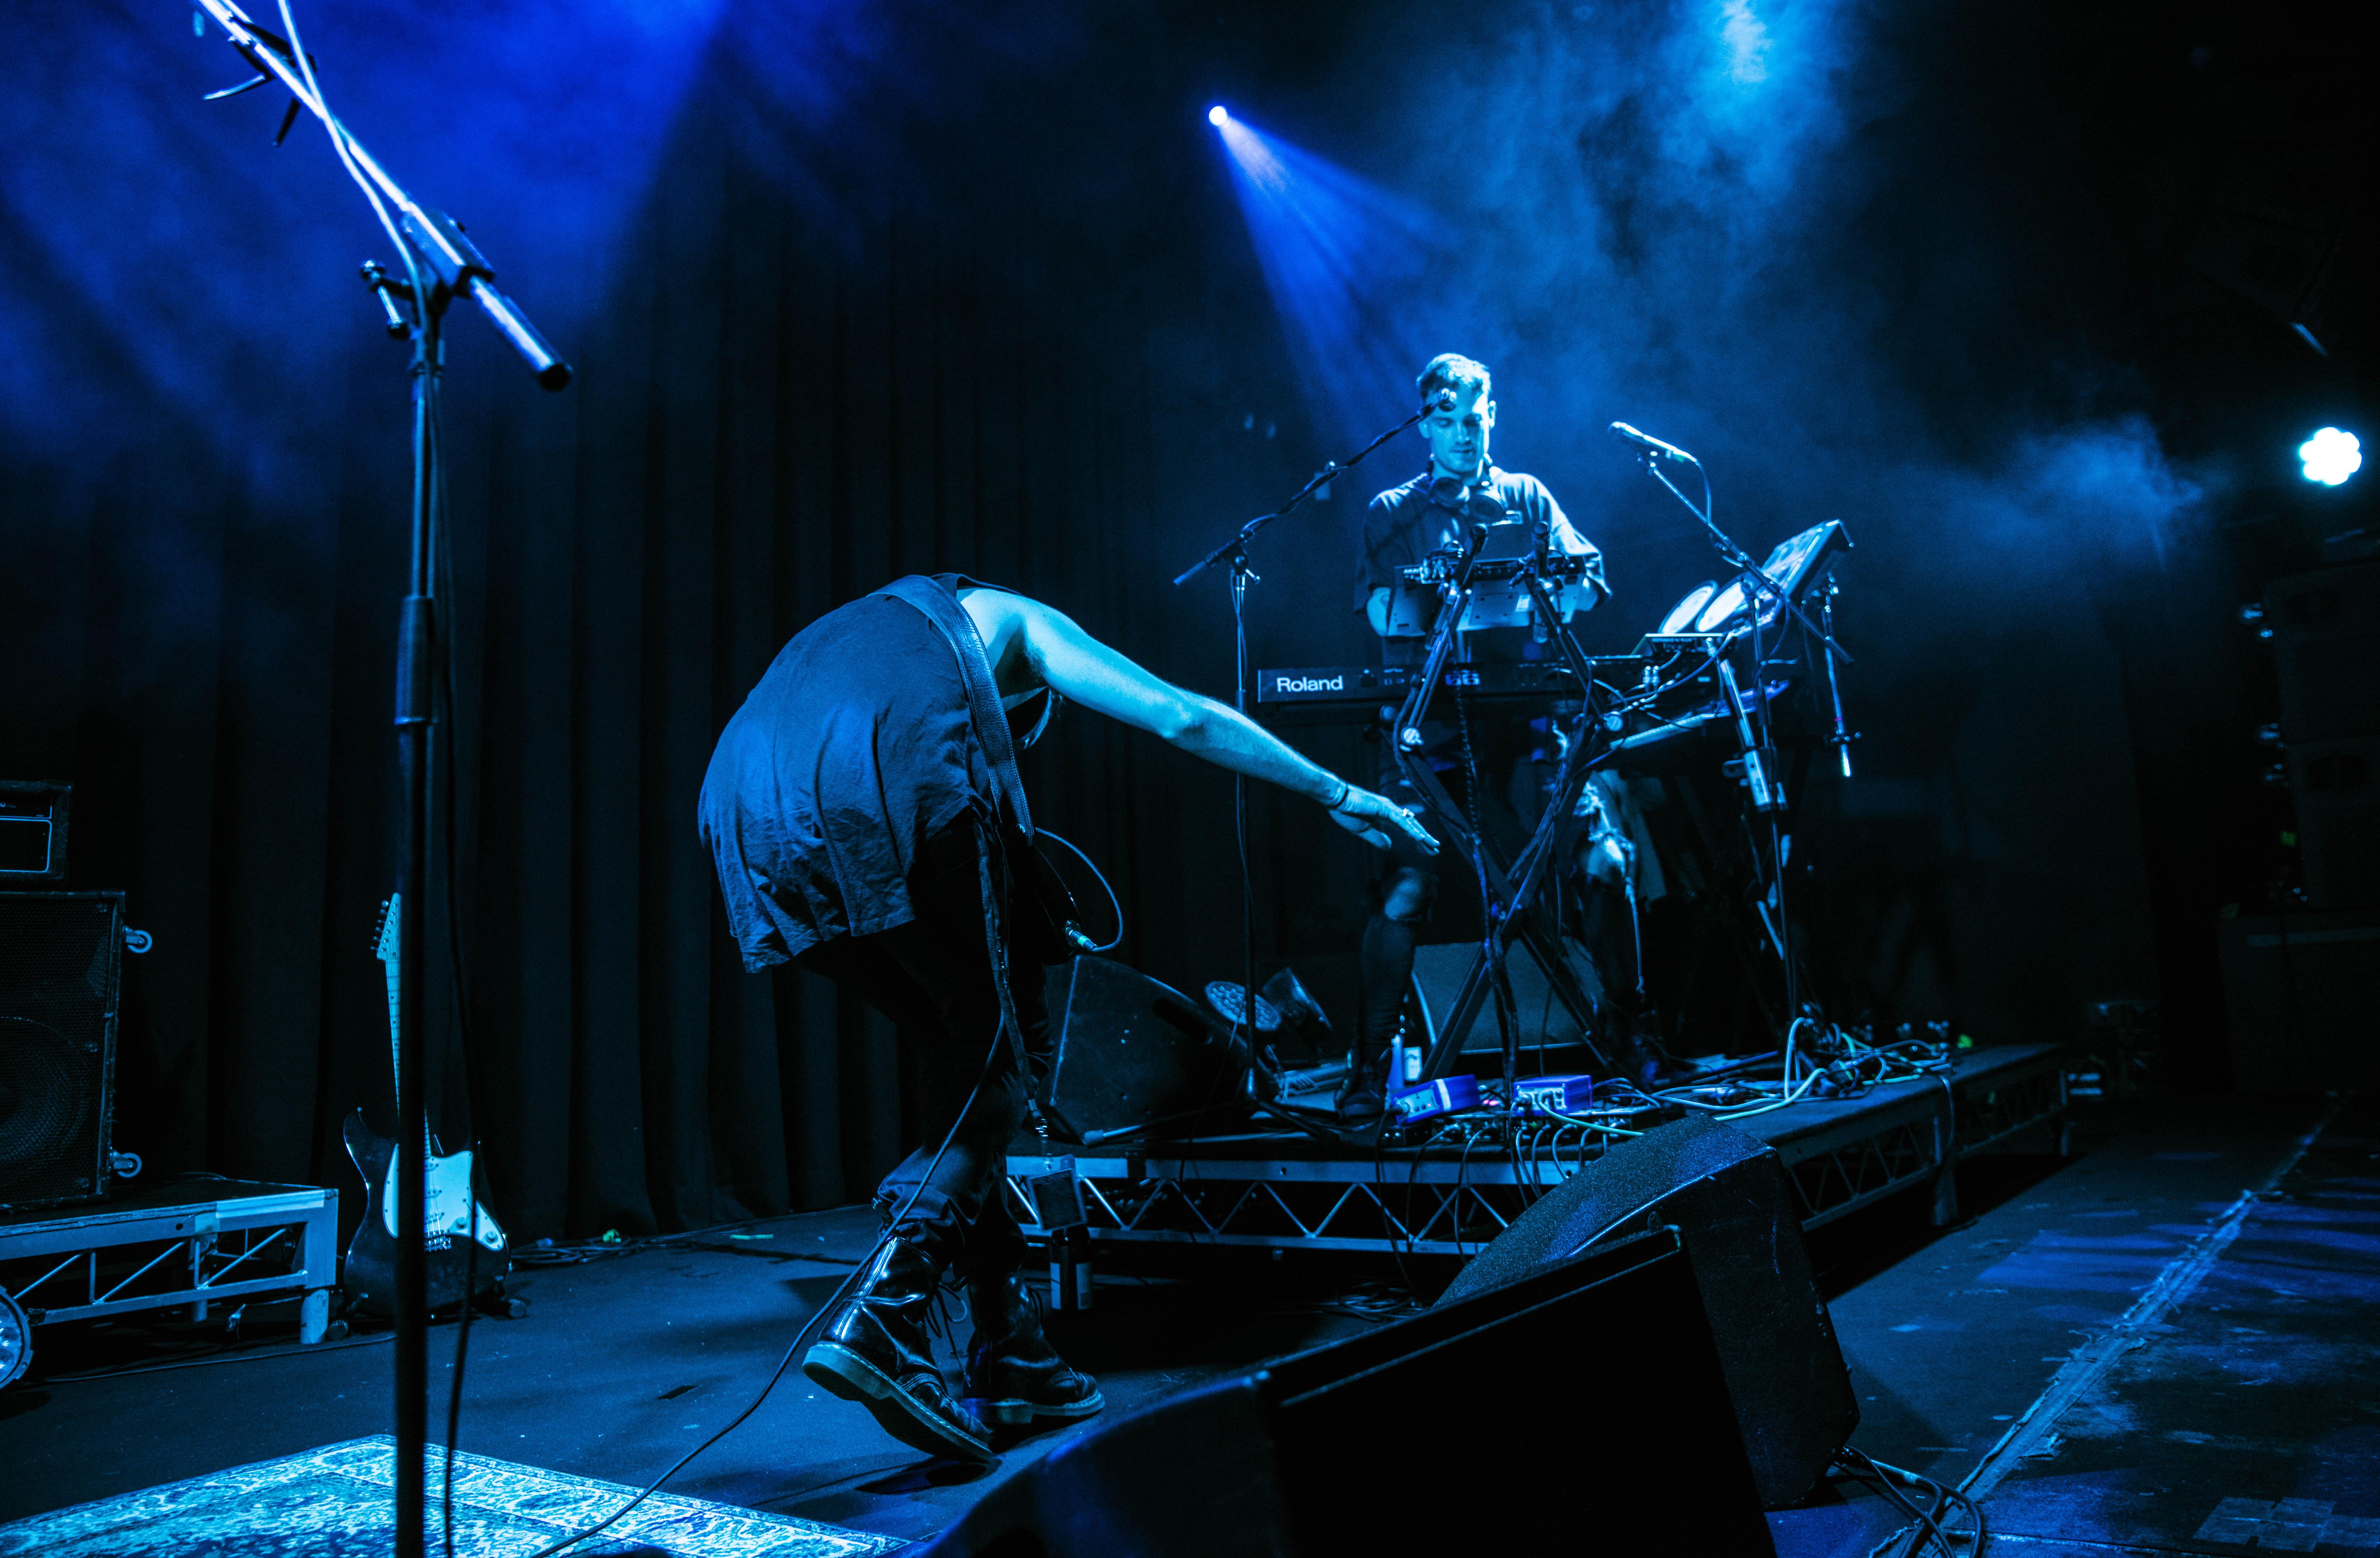 boo seeka music live review sydney photo credit dominique burns blackwell savage thrills savagethrills 4